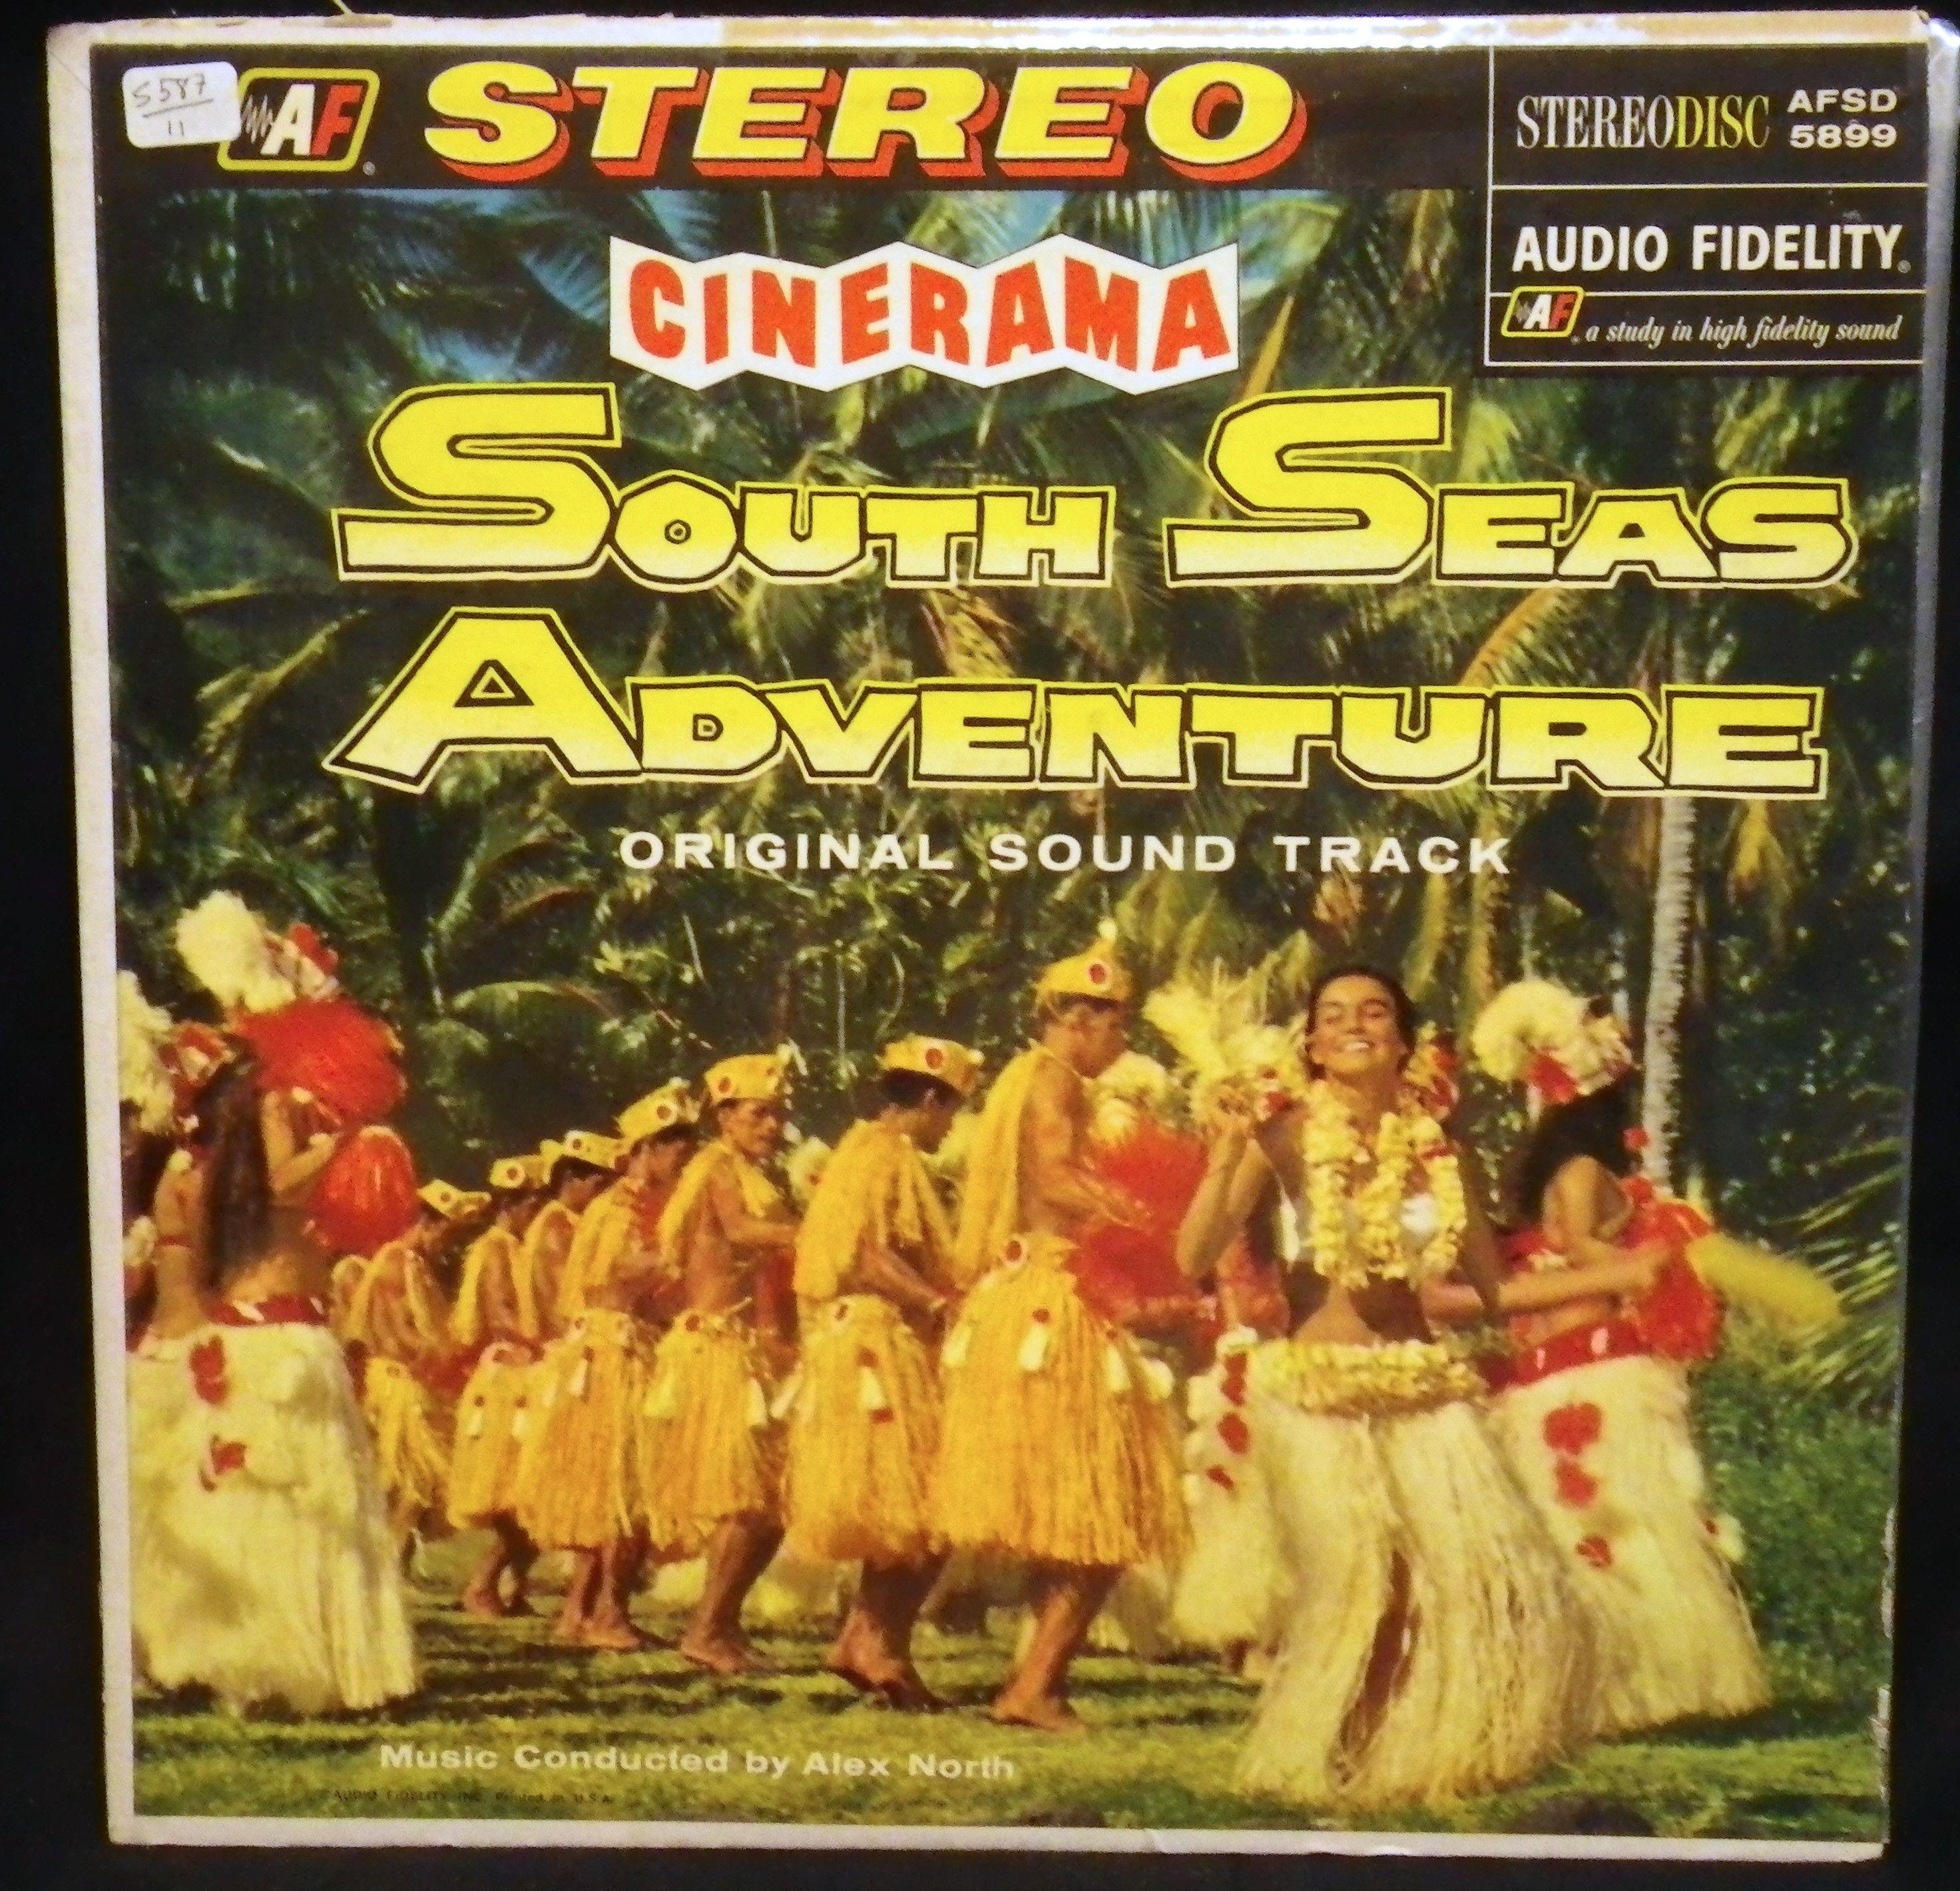 Cinerama South Seas Adventure Original Film Soundtrack By Cinerama Symphony Orchestra Alex North Conductor Adventure Of The Seas The Originals South Seas